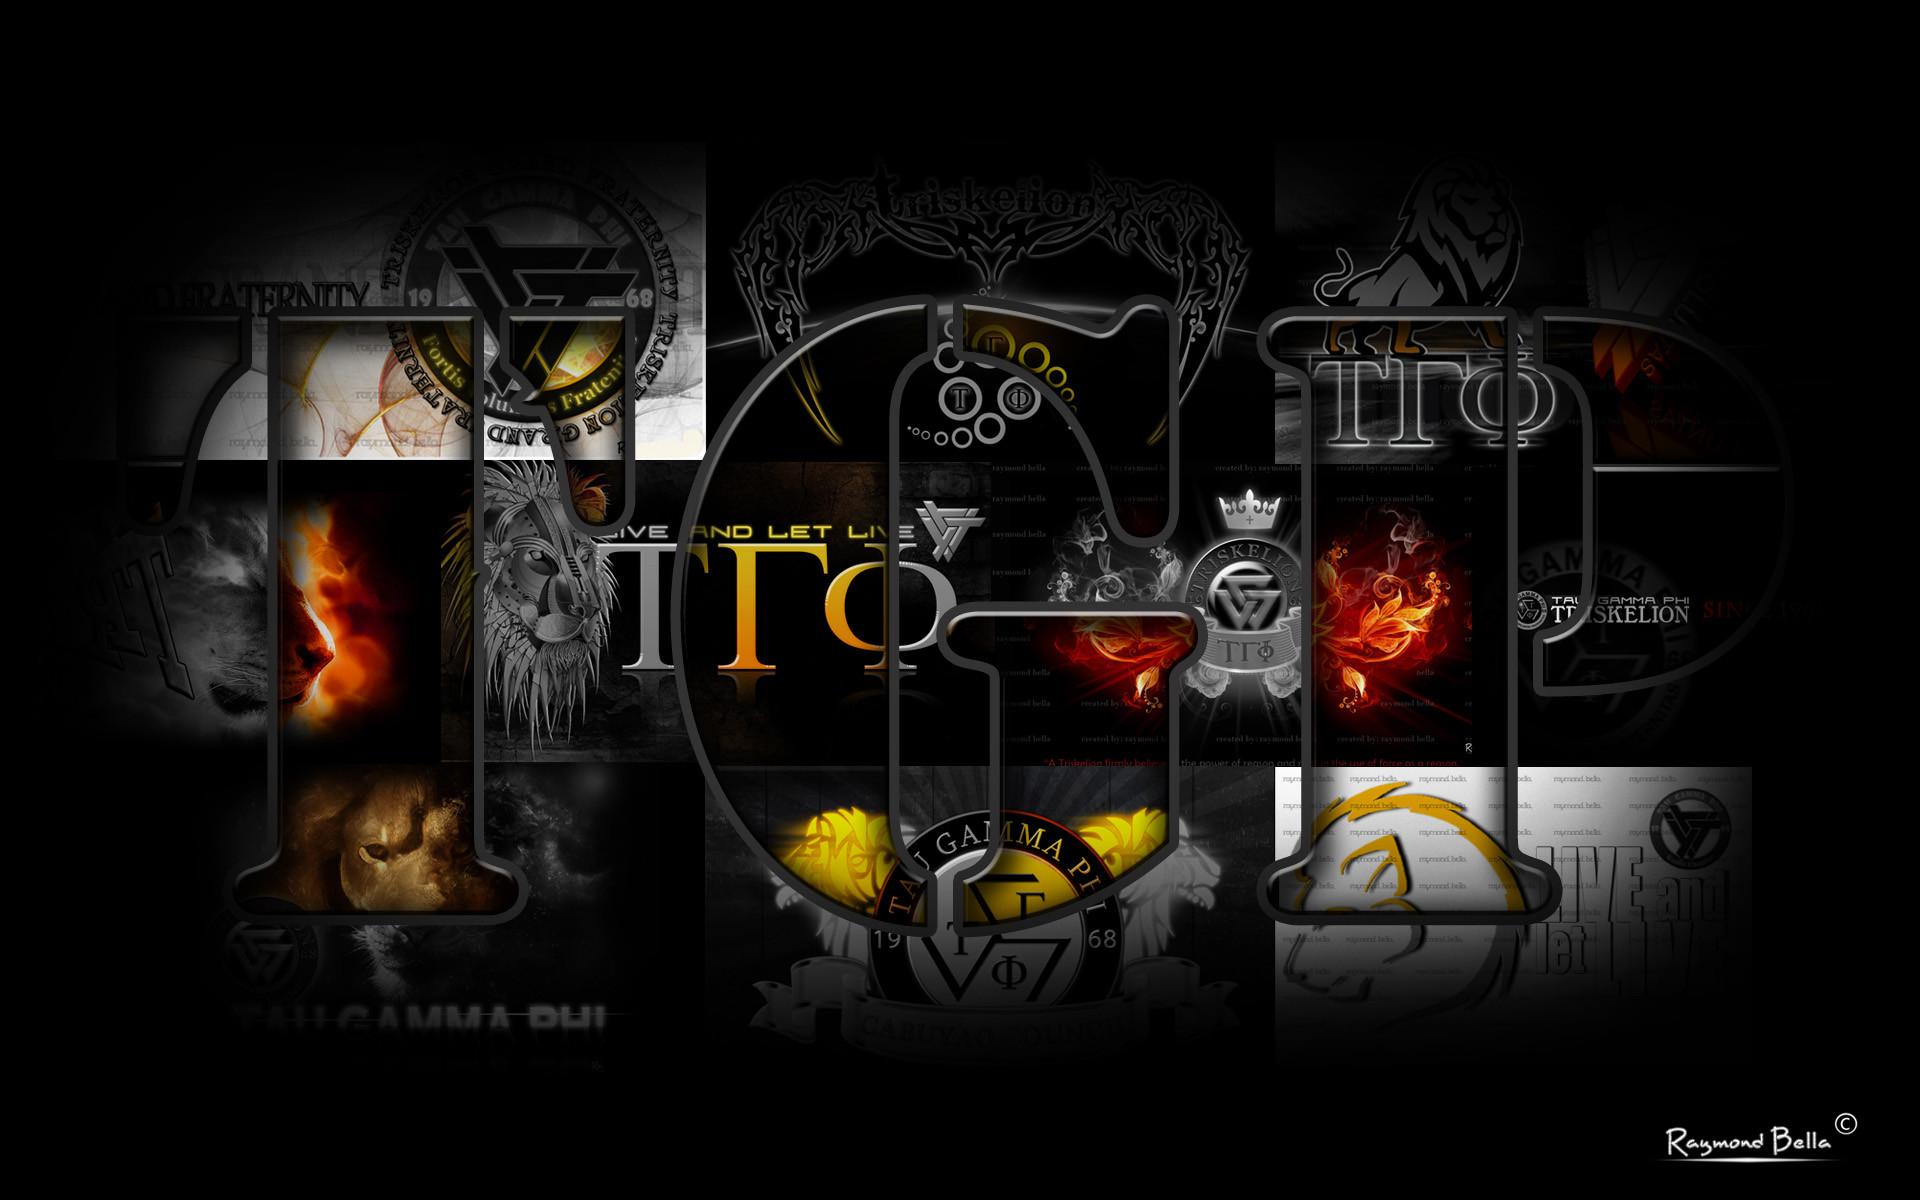 Tau Gamma Phi – Triskelion by pdtrash on DeviantArt